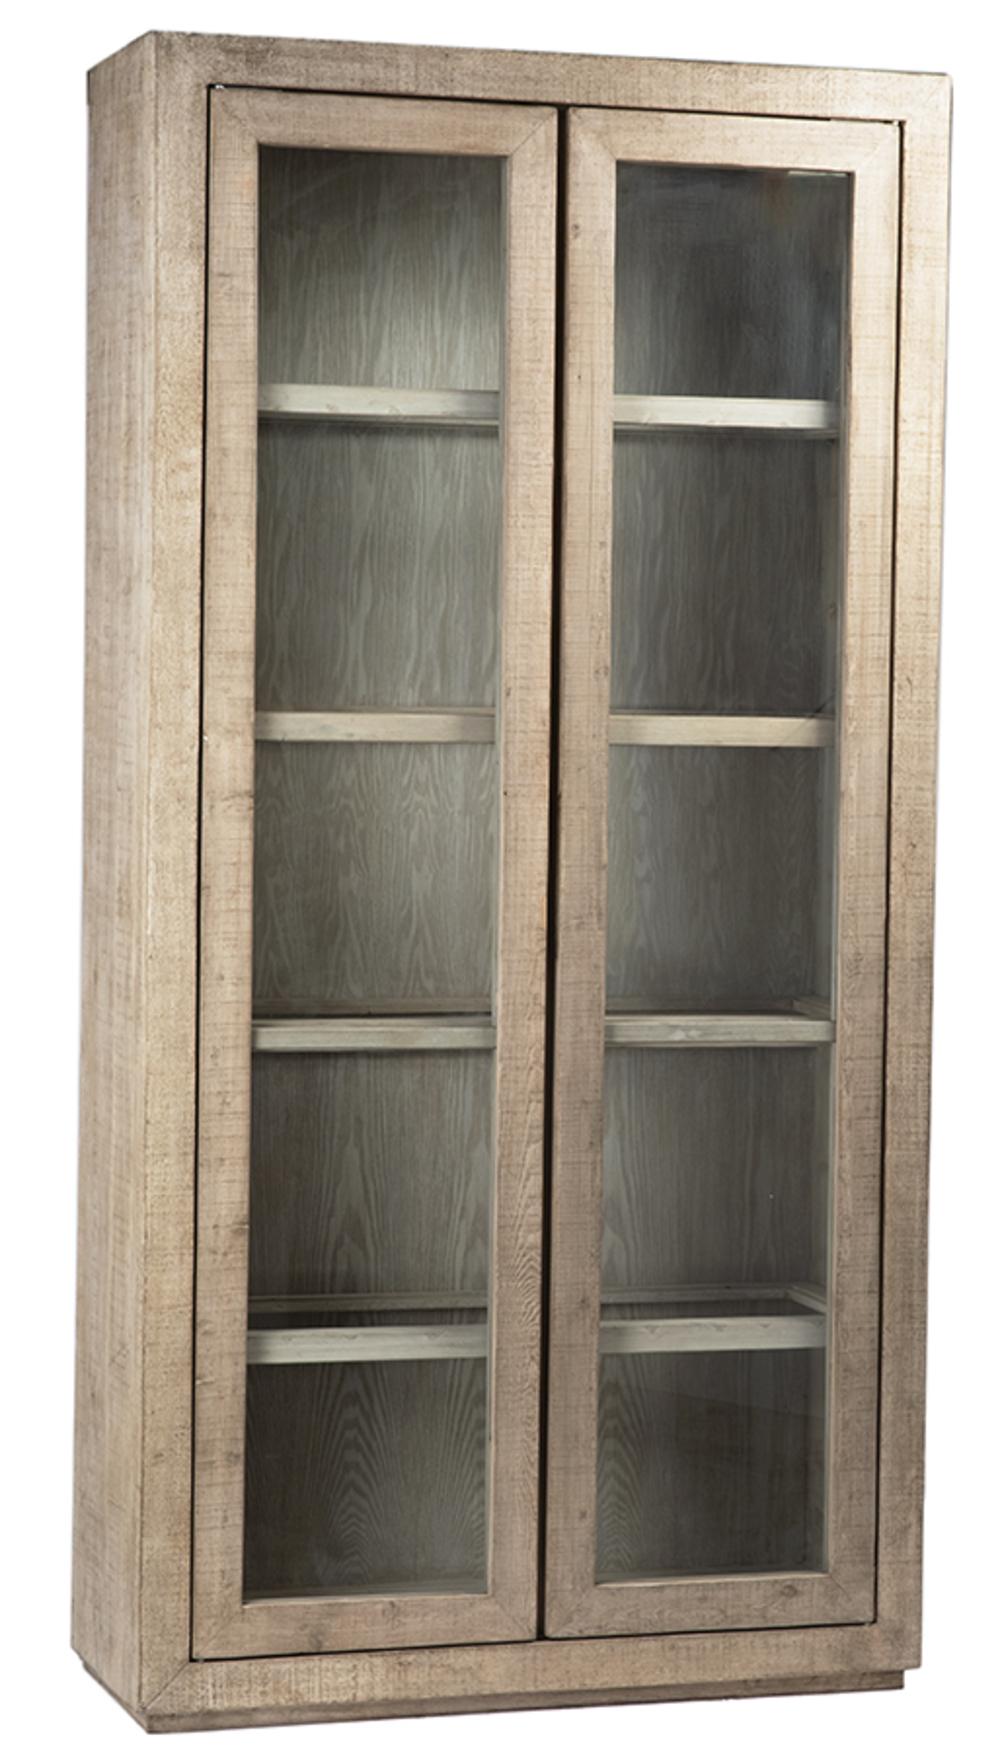 Dovetail Furniture - Suffolk Cabinet